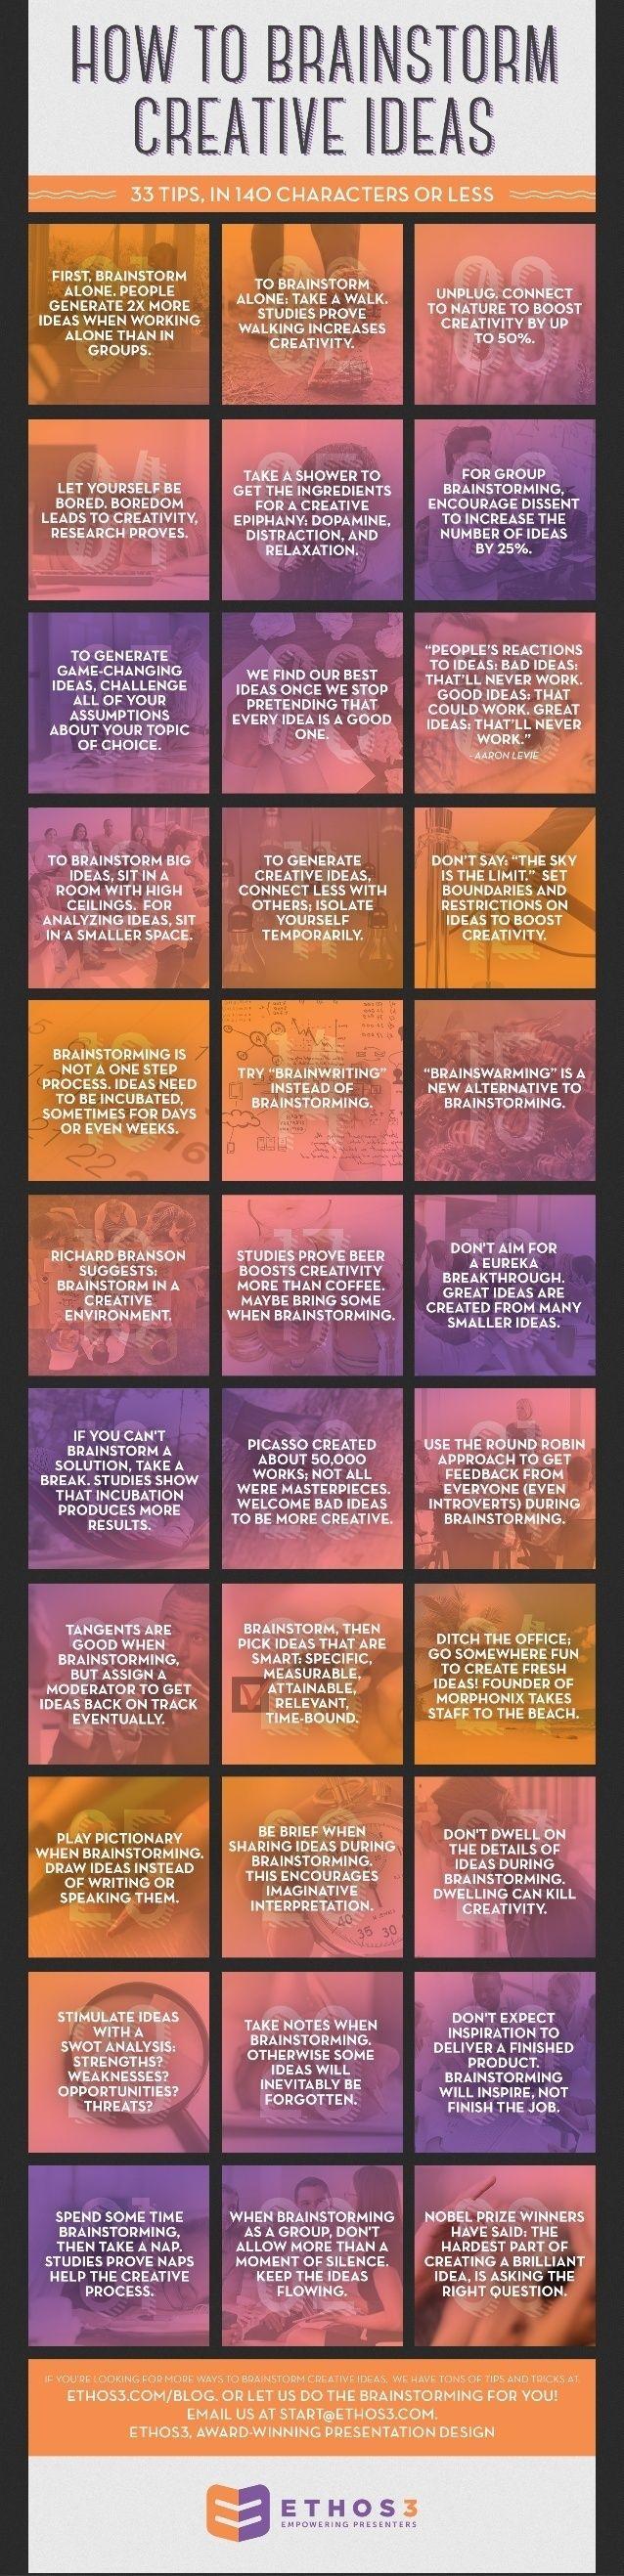 33 Creative Ways To Brainstorm Ideas | Creatives | Creative